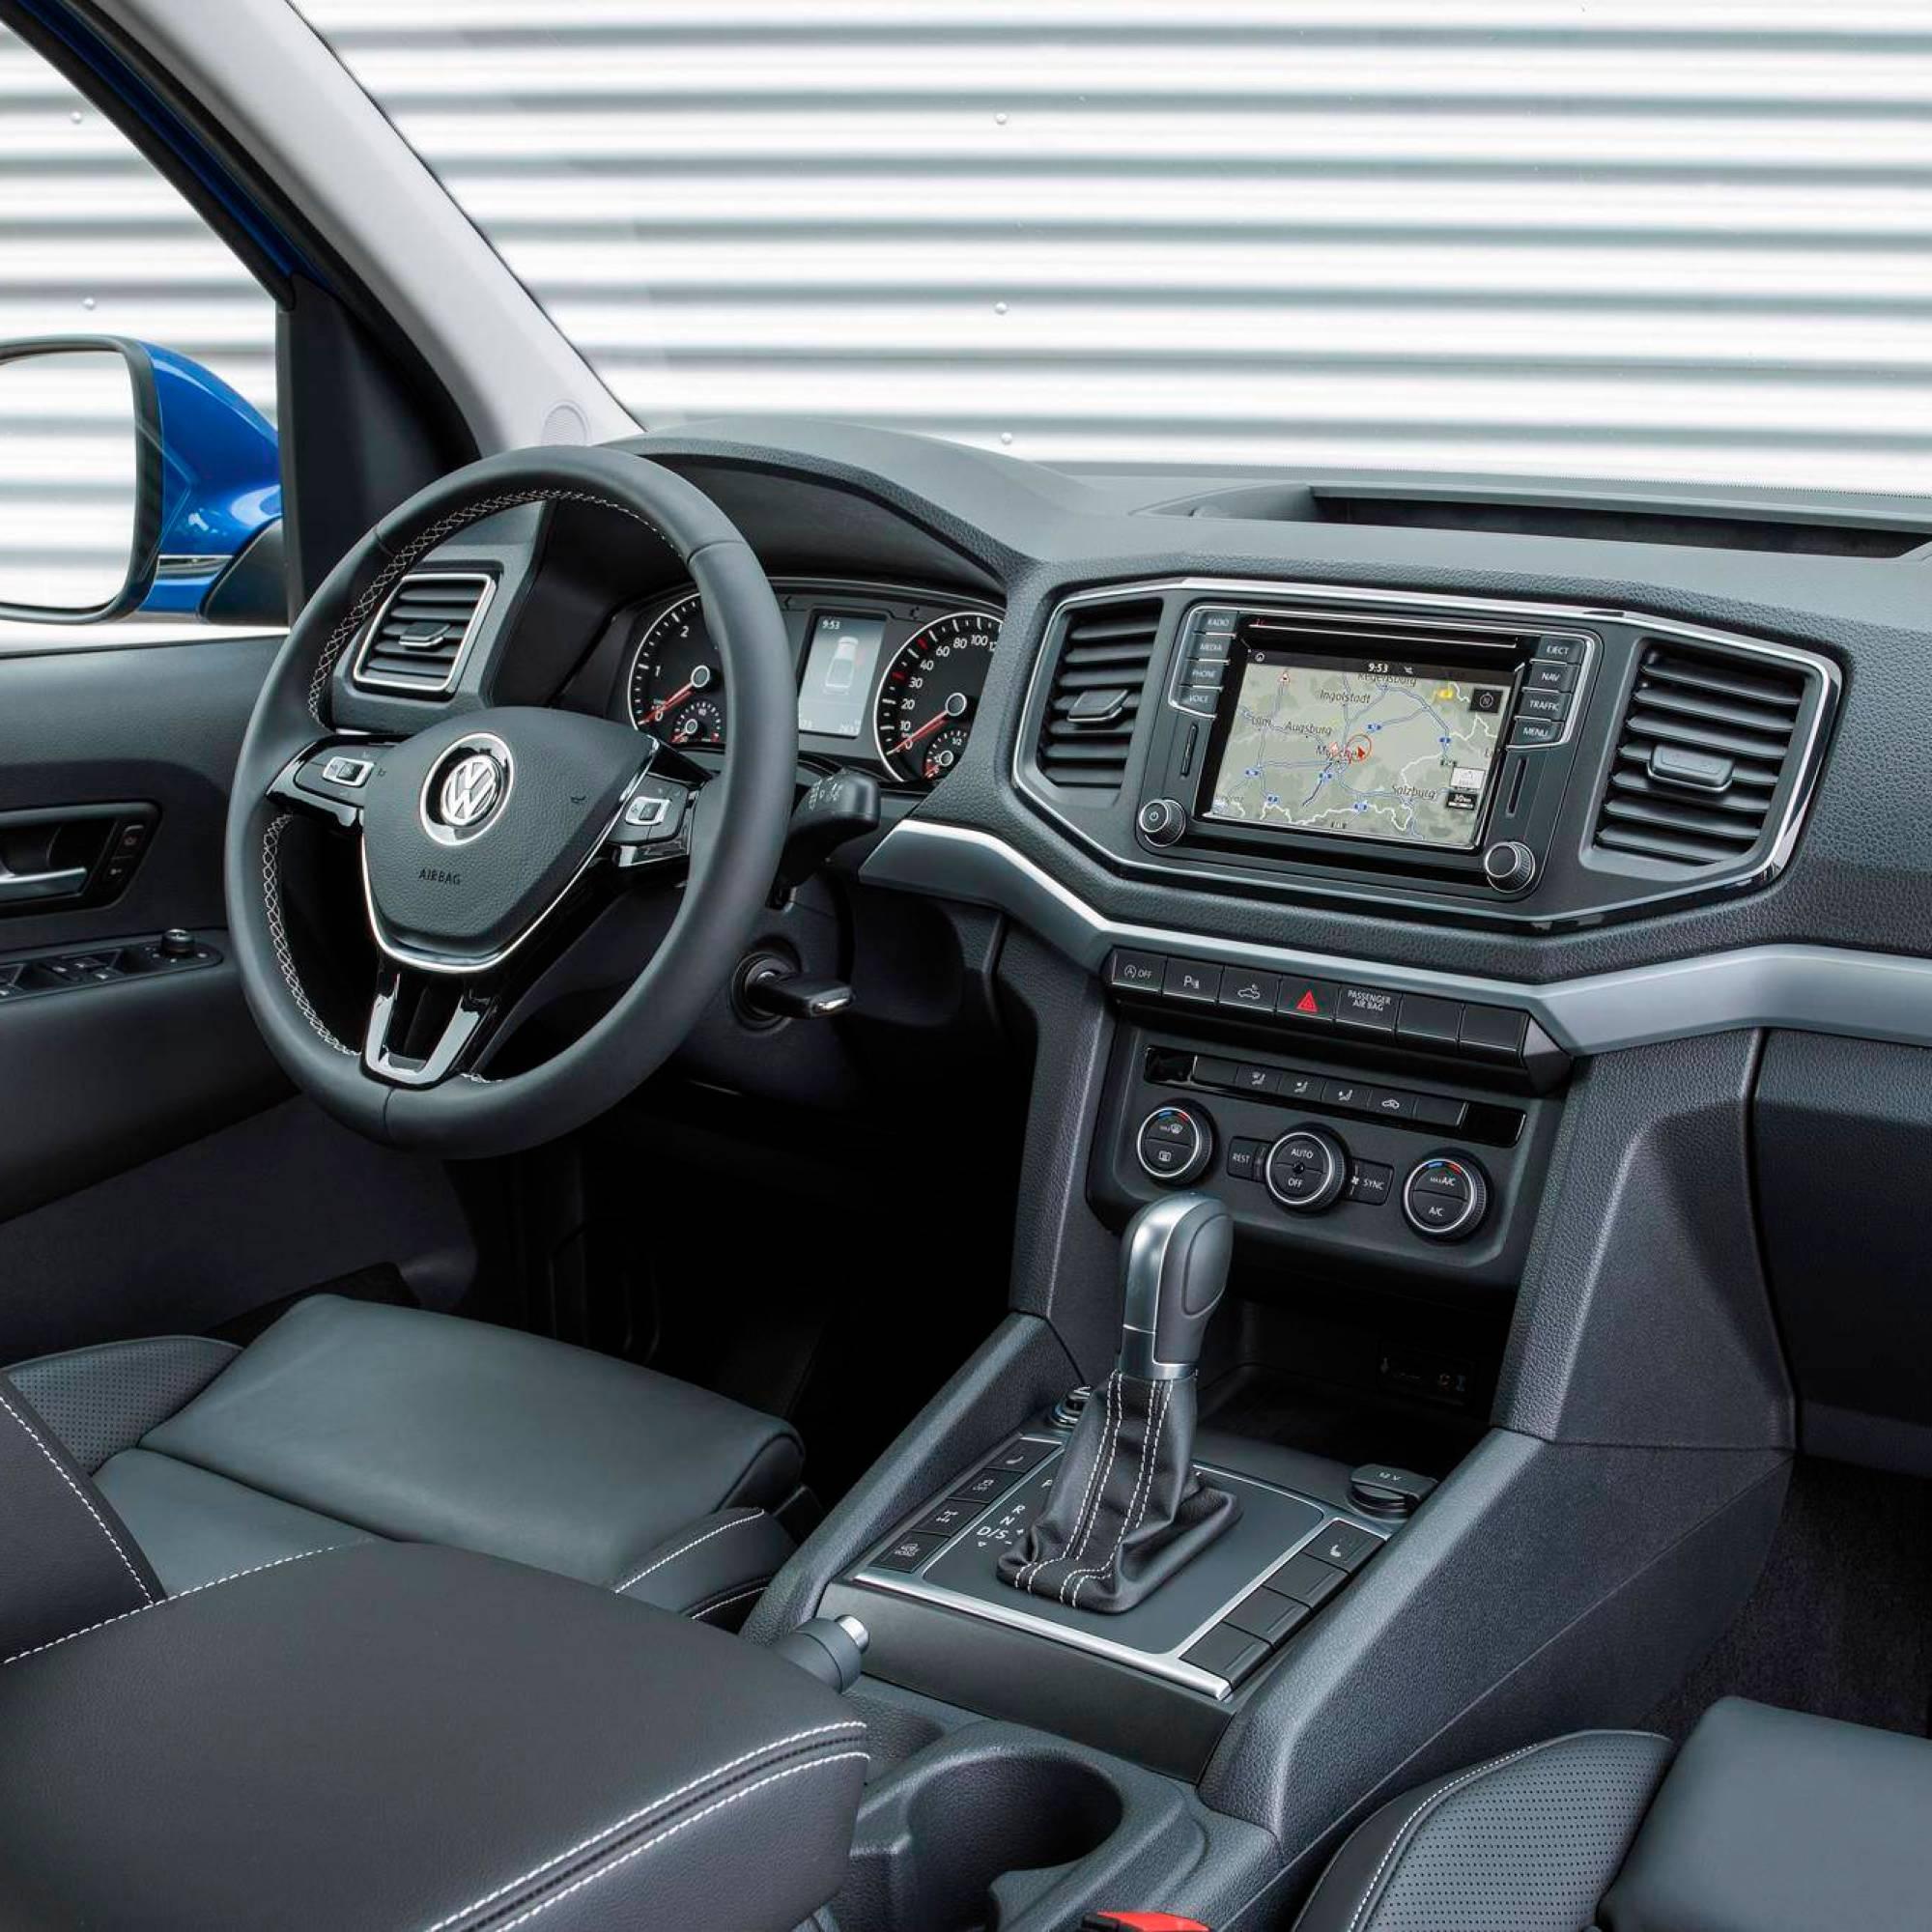 compra de carros entusiasta gearhead vwamarok v6 interior